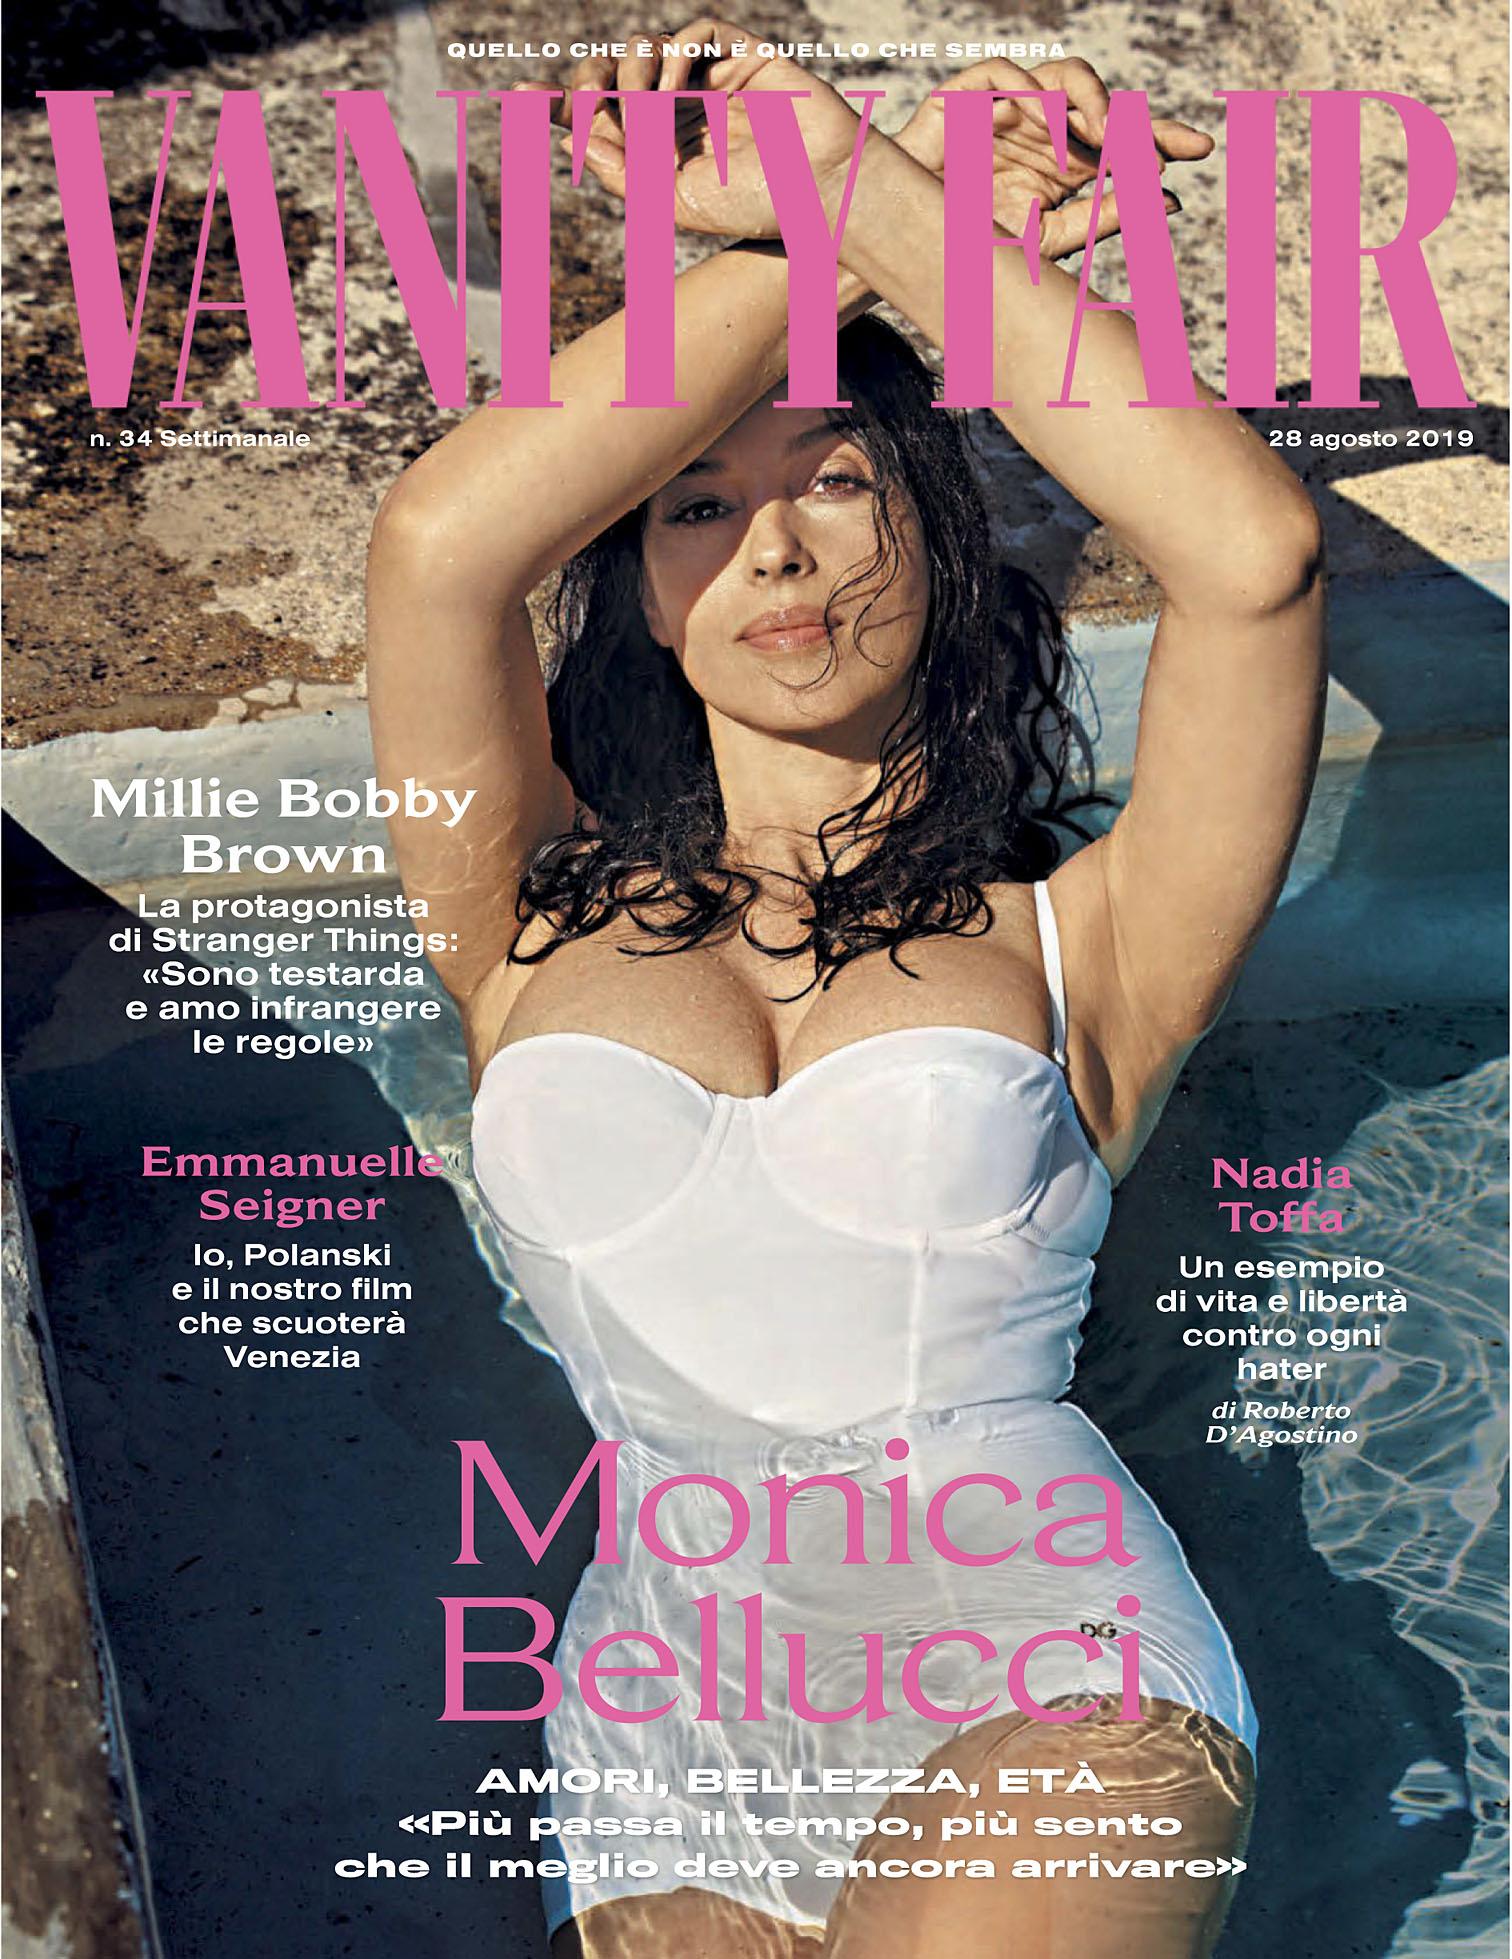 Vanity Fair Italia 2019-08-28 MBellucci1.jpg